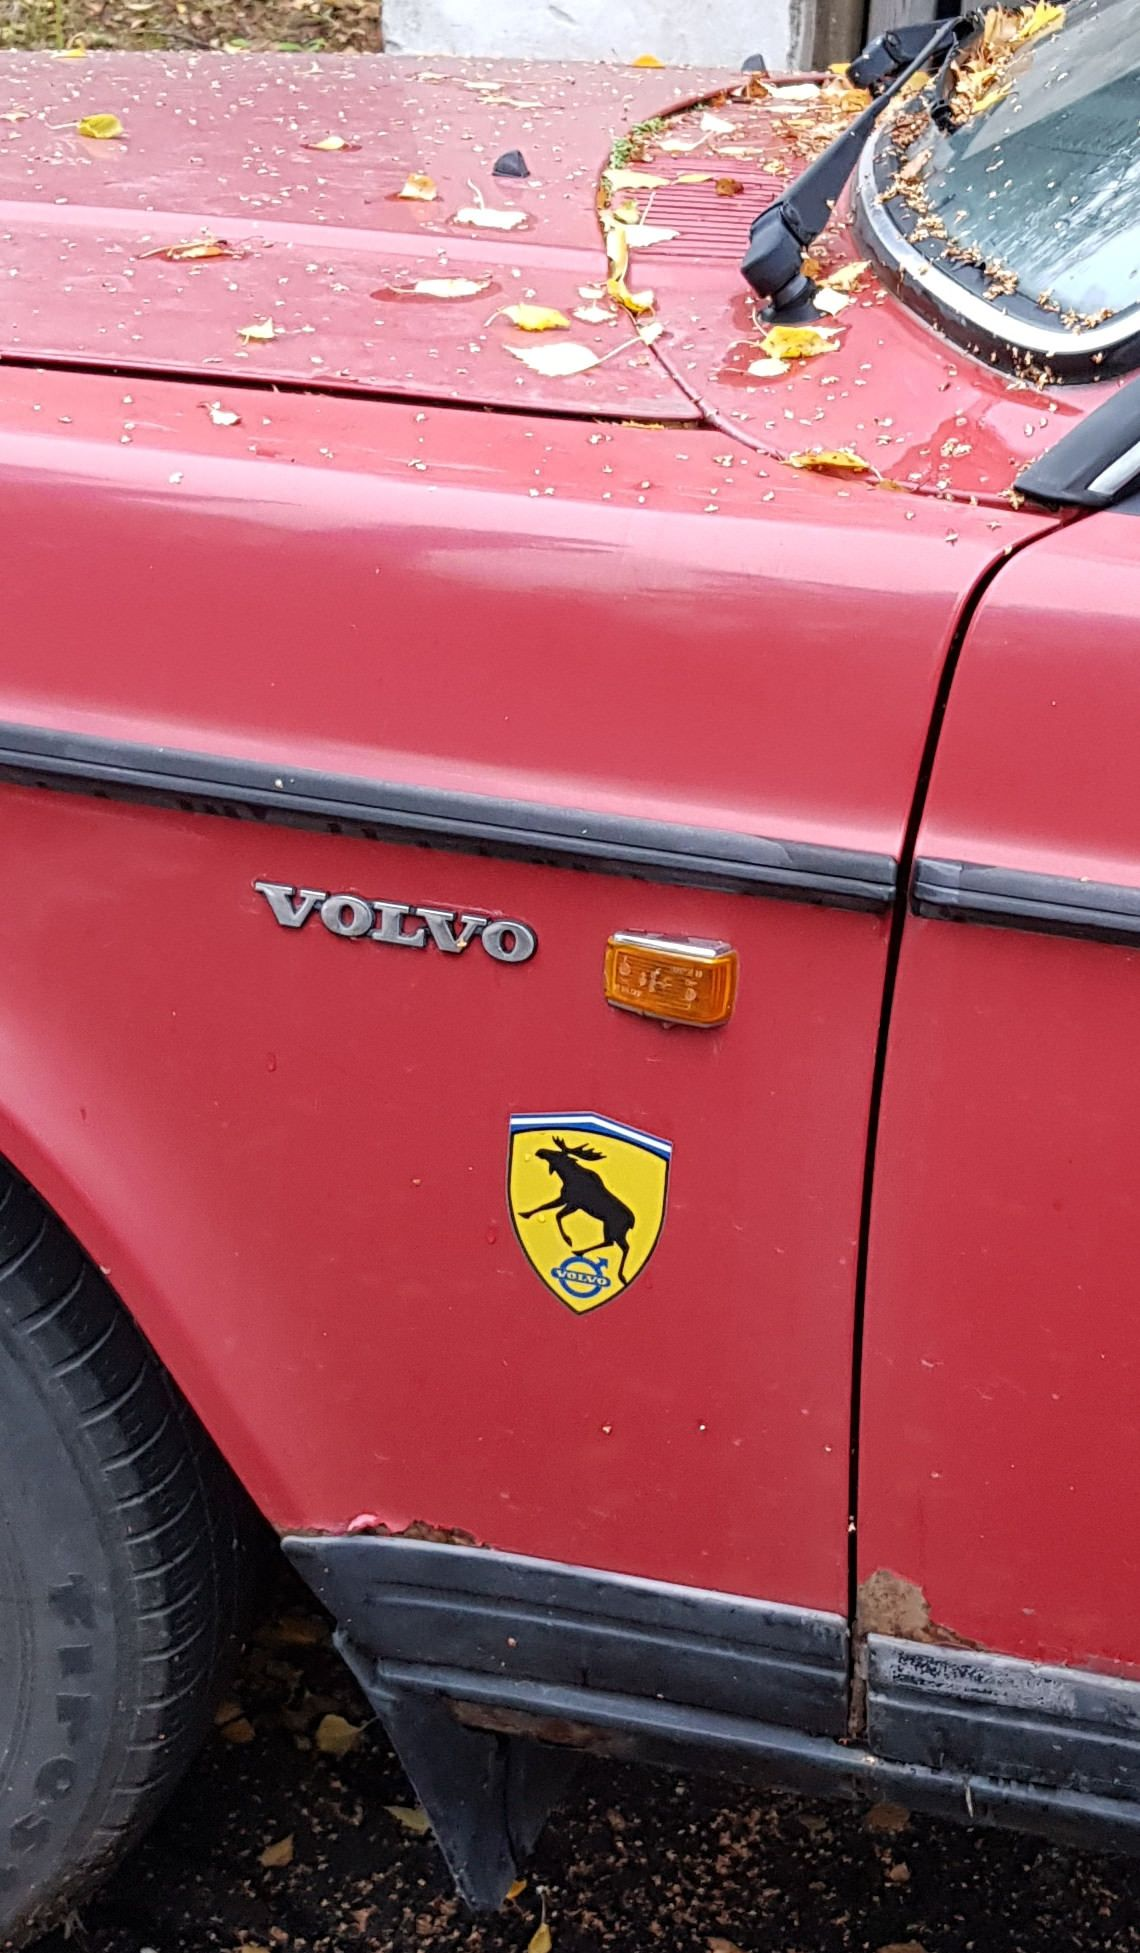 The Swedish Ferrari